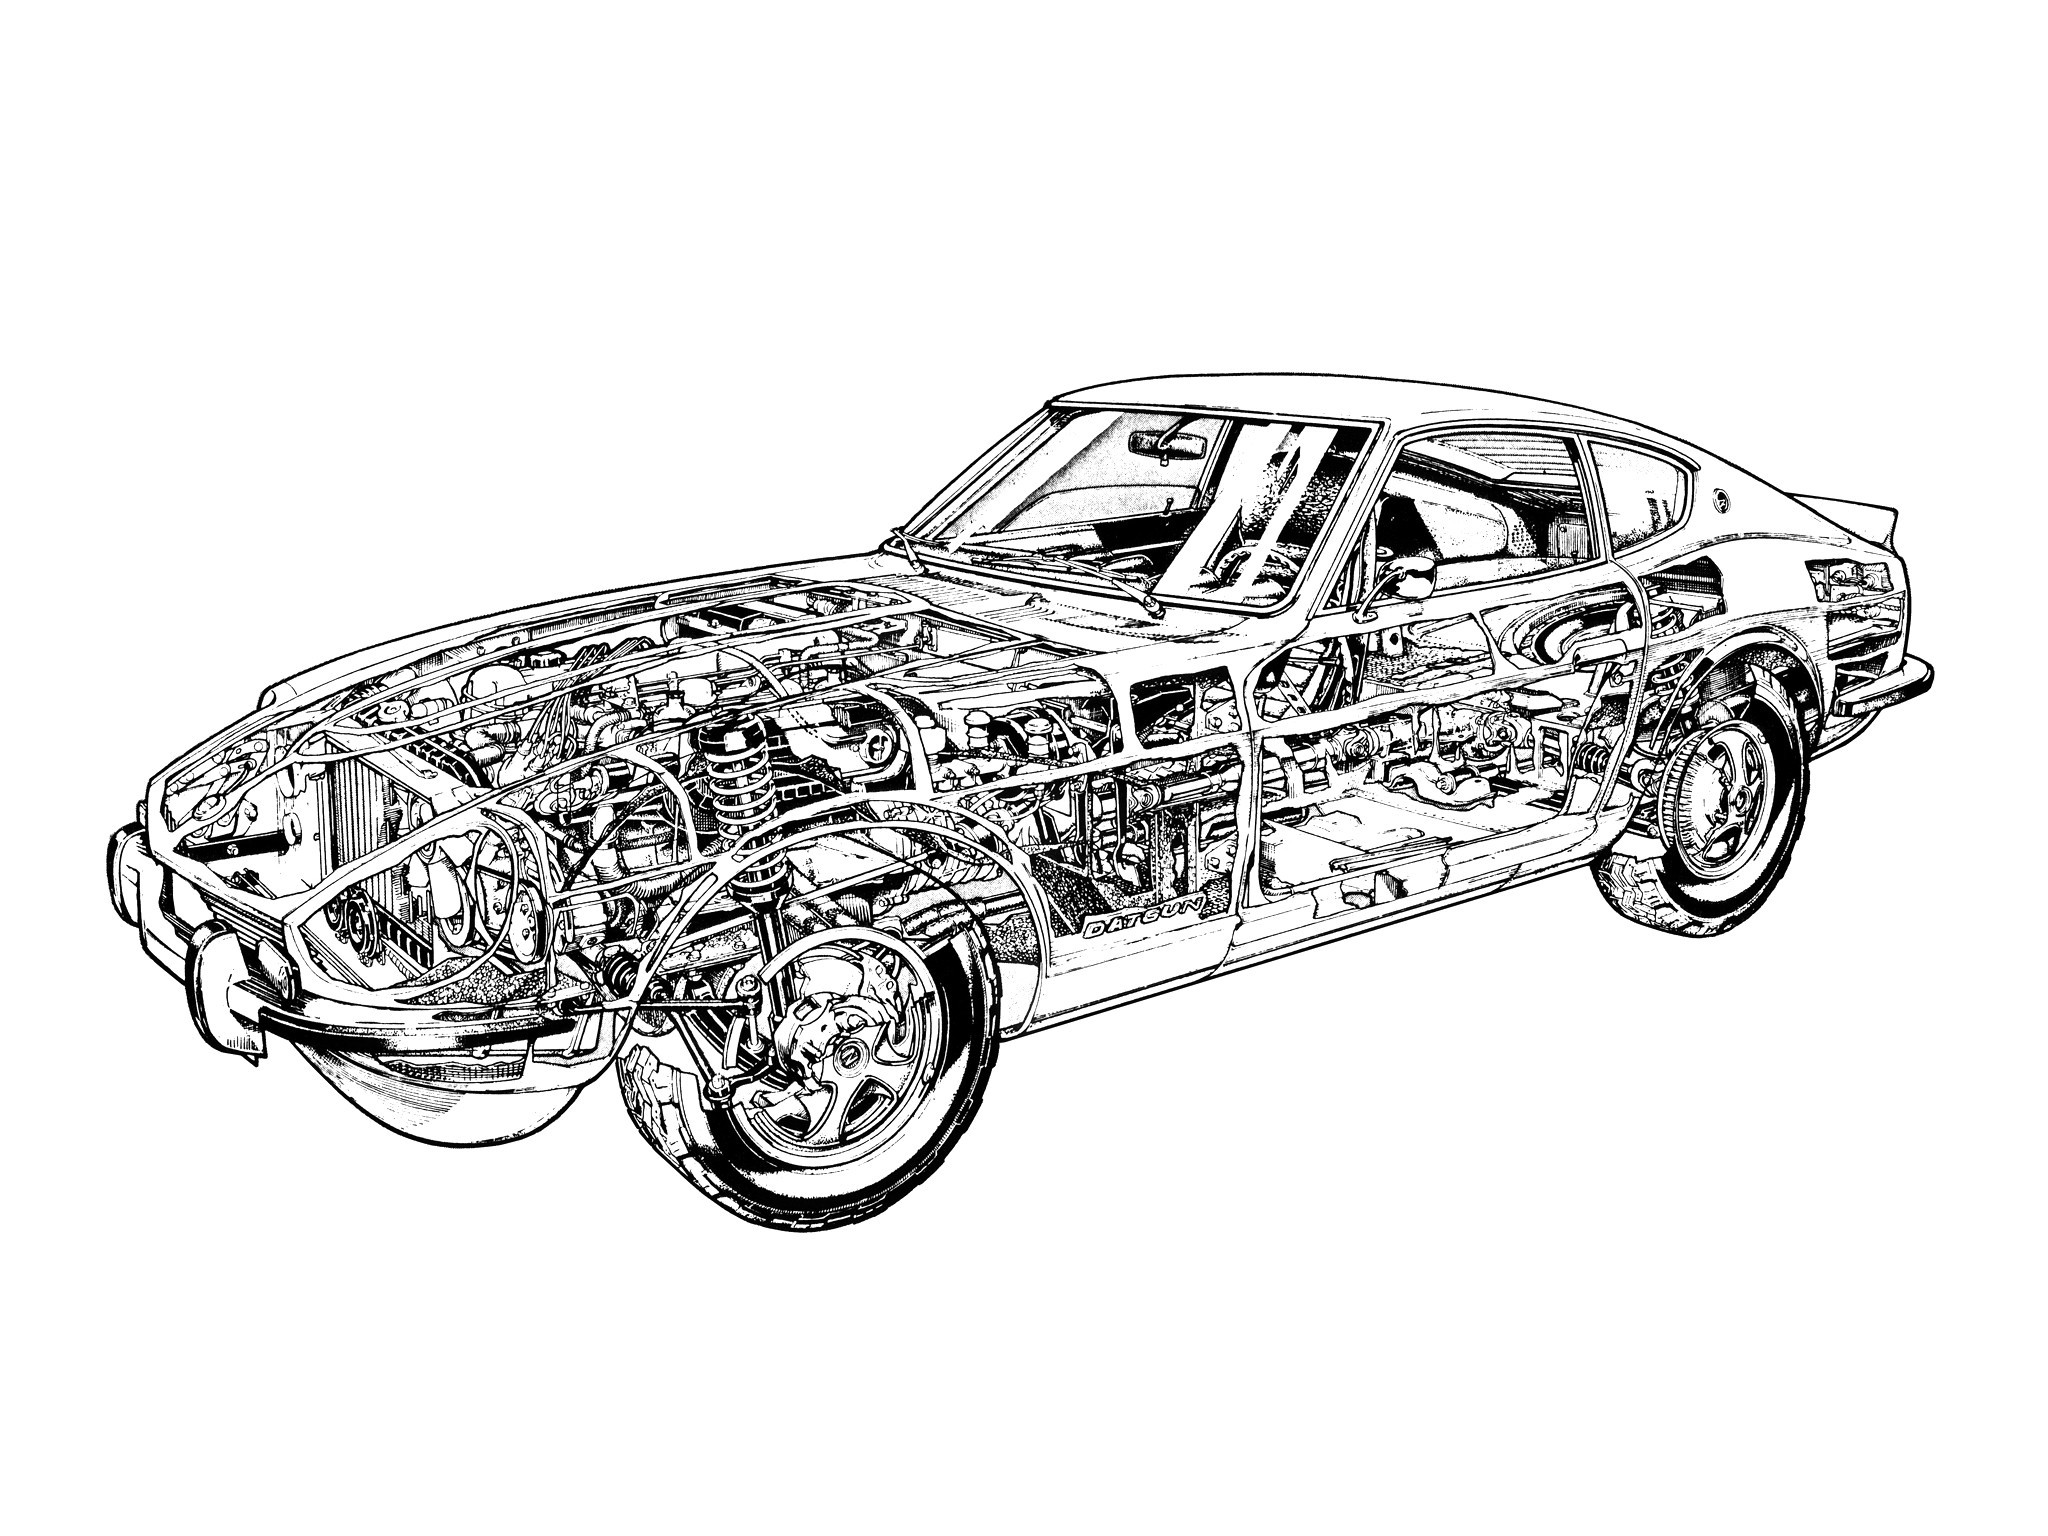 Datsun 240z Wallpaper 61 Images